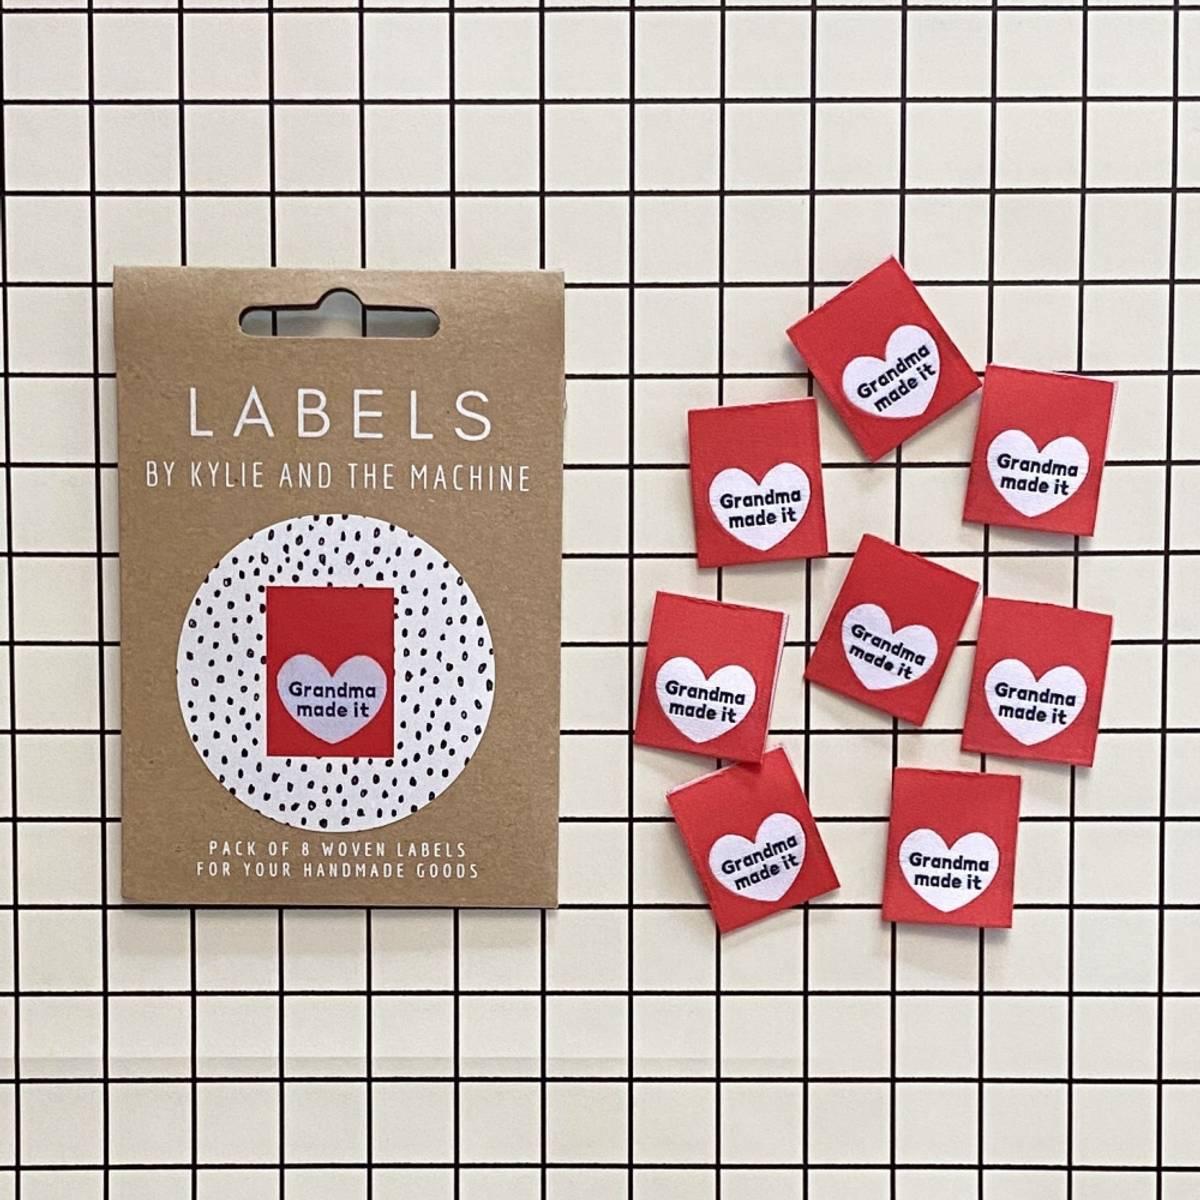 Labels - Grandma made it